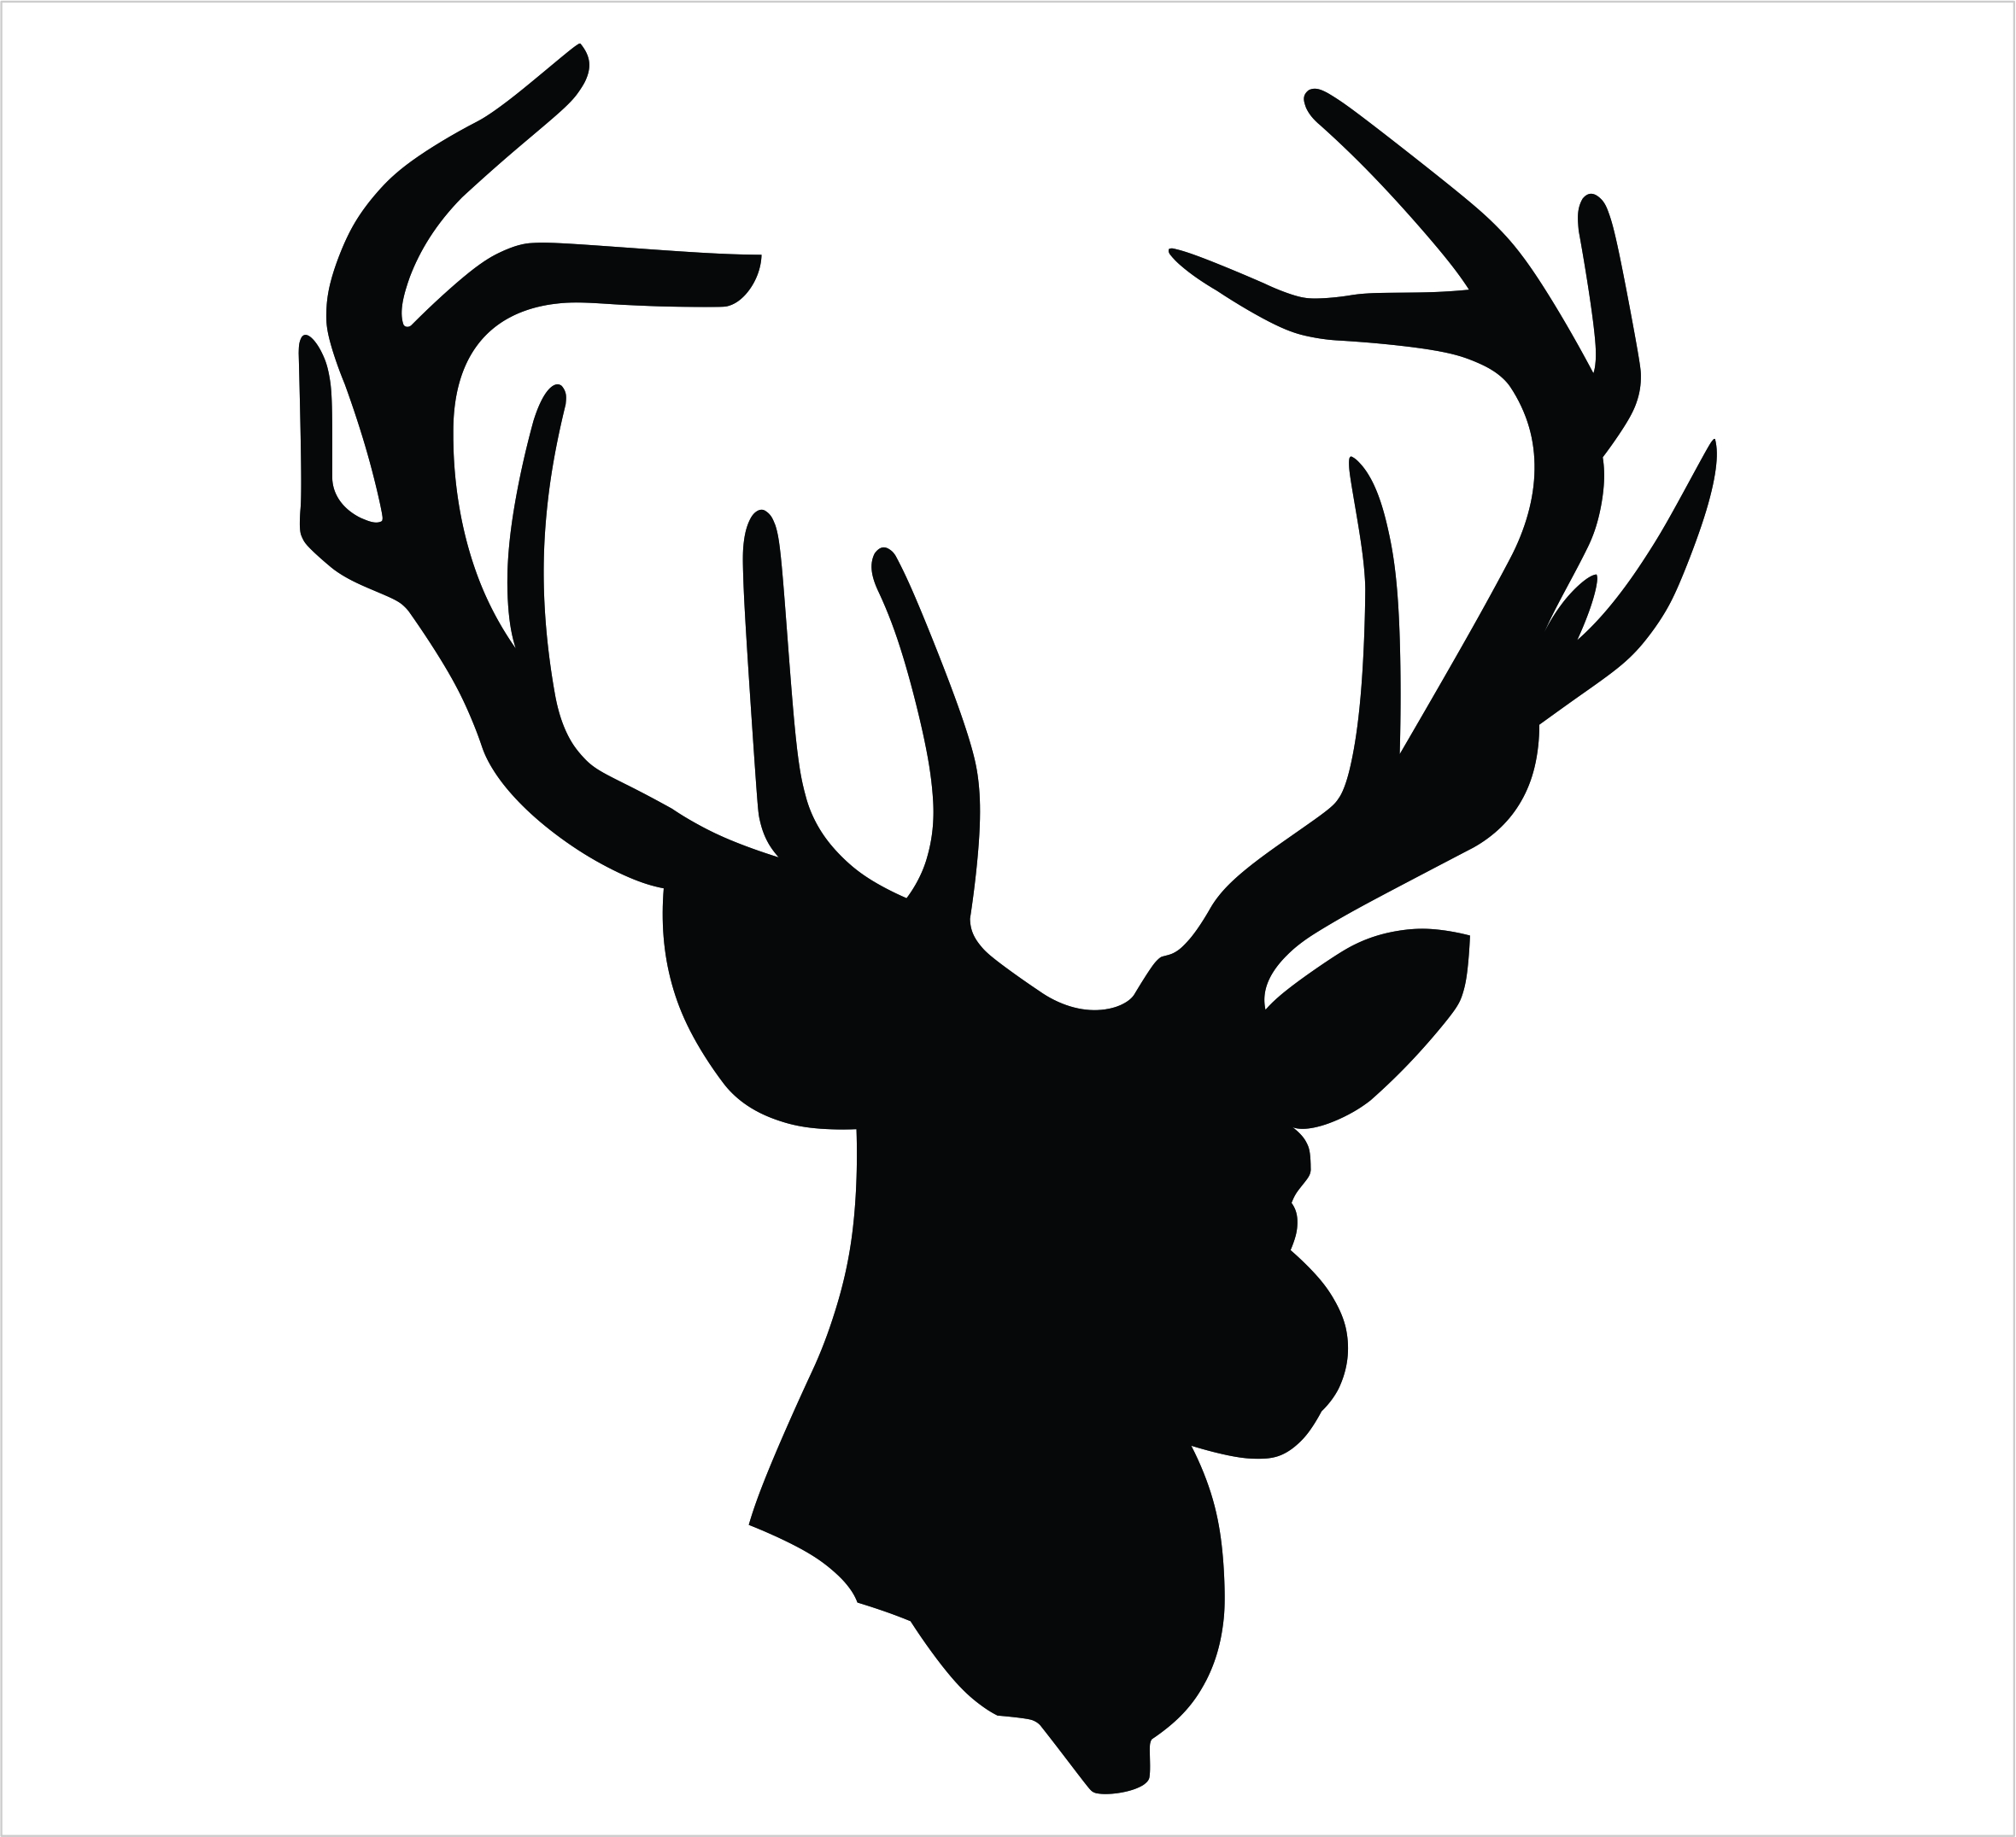 2360x2151 Deer Head Silhouette Free Download Clip Art On Bright Antlers